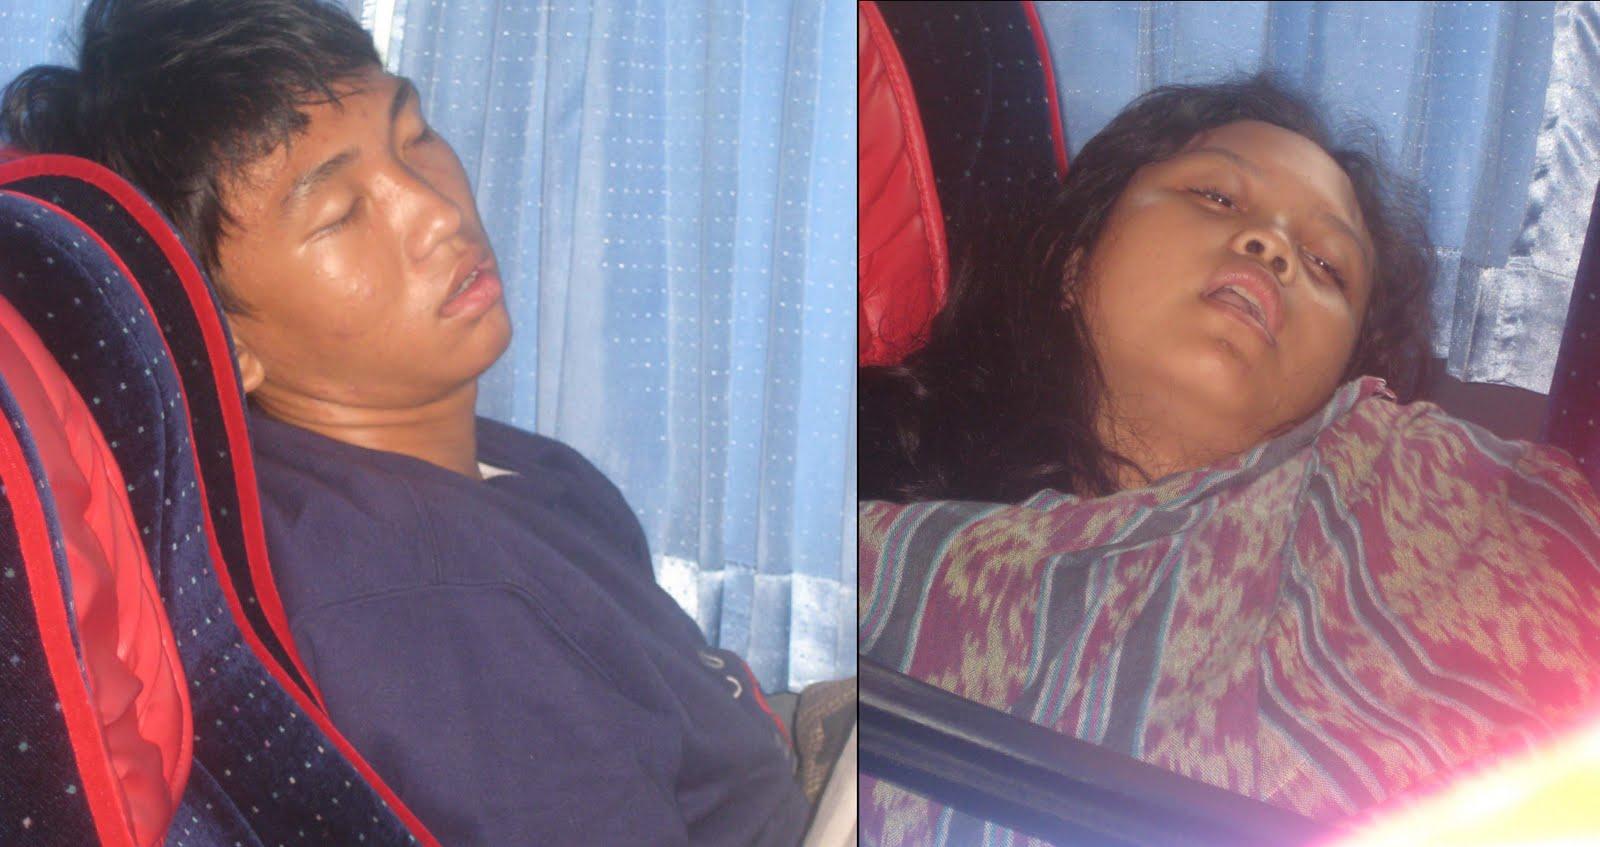 lagi tidur muahahaha dan inilah posisi tidur terbaik di mobi